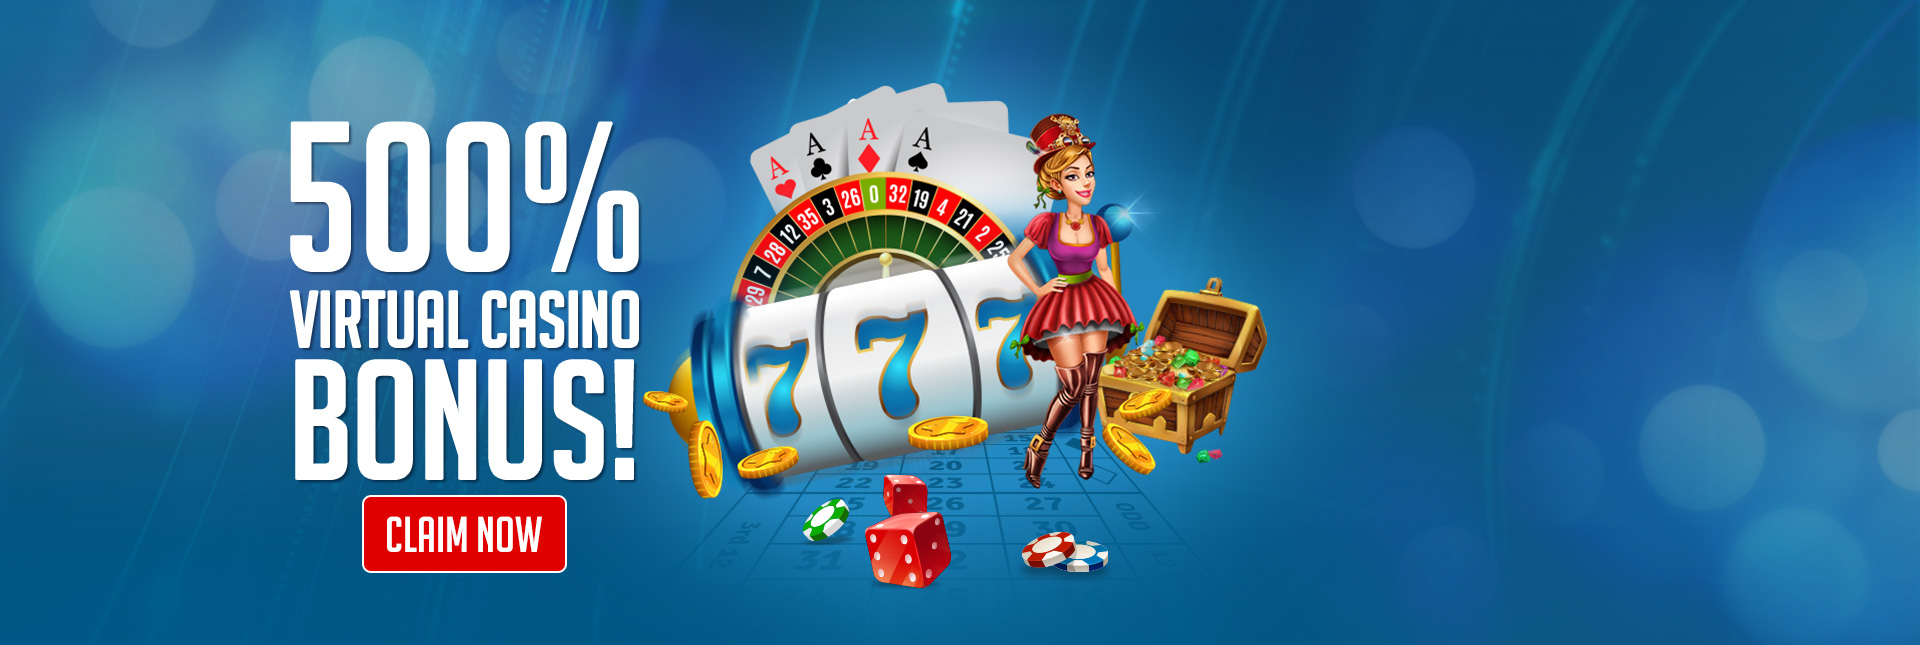 500% Virtual Casino Bonus